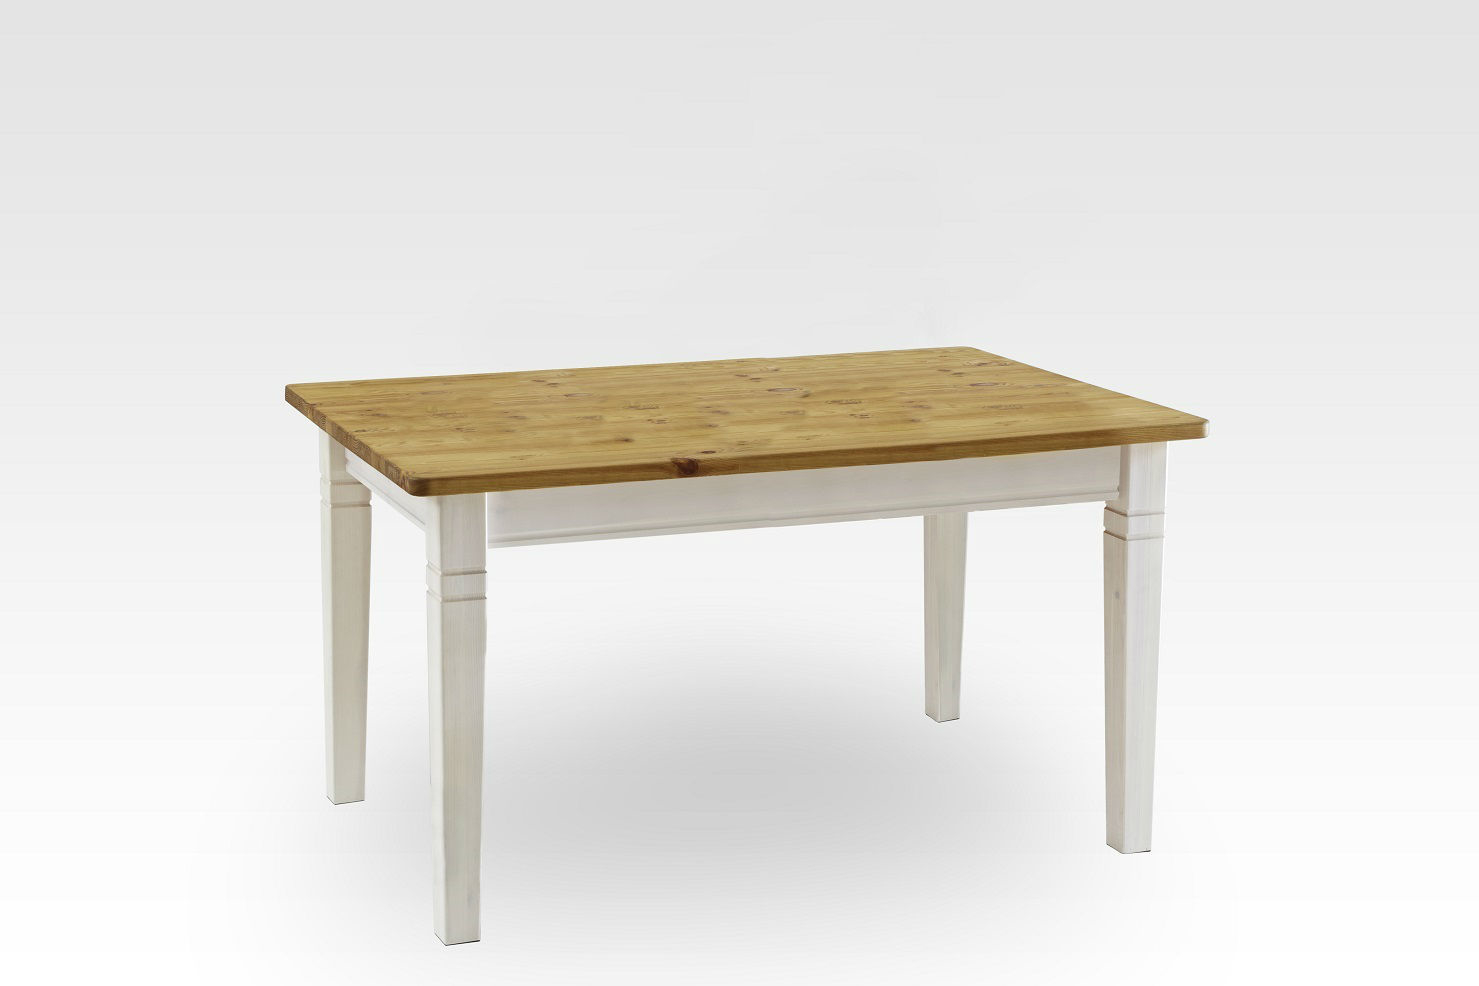 Esszimmer Tisch Bergen rechteckig Landhausstil, 120 x 78 cm, komplett gelaugt geölt